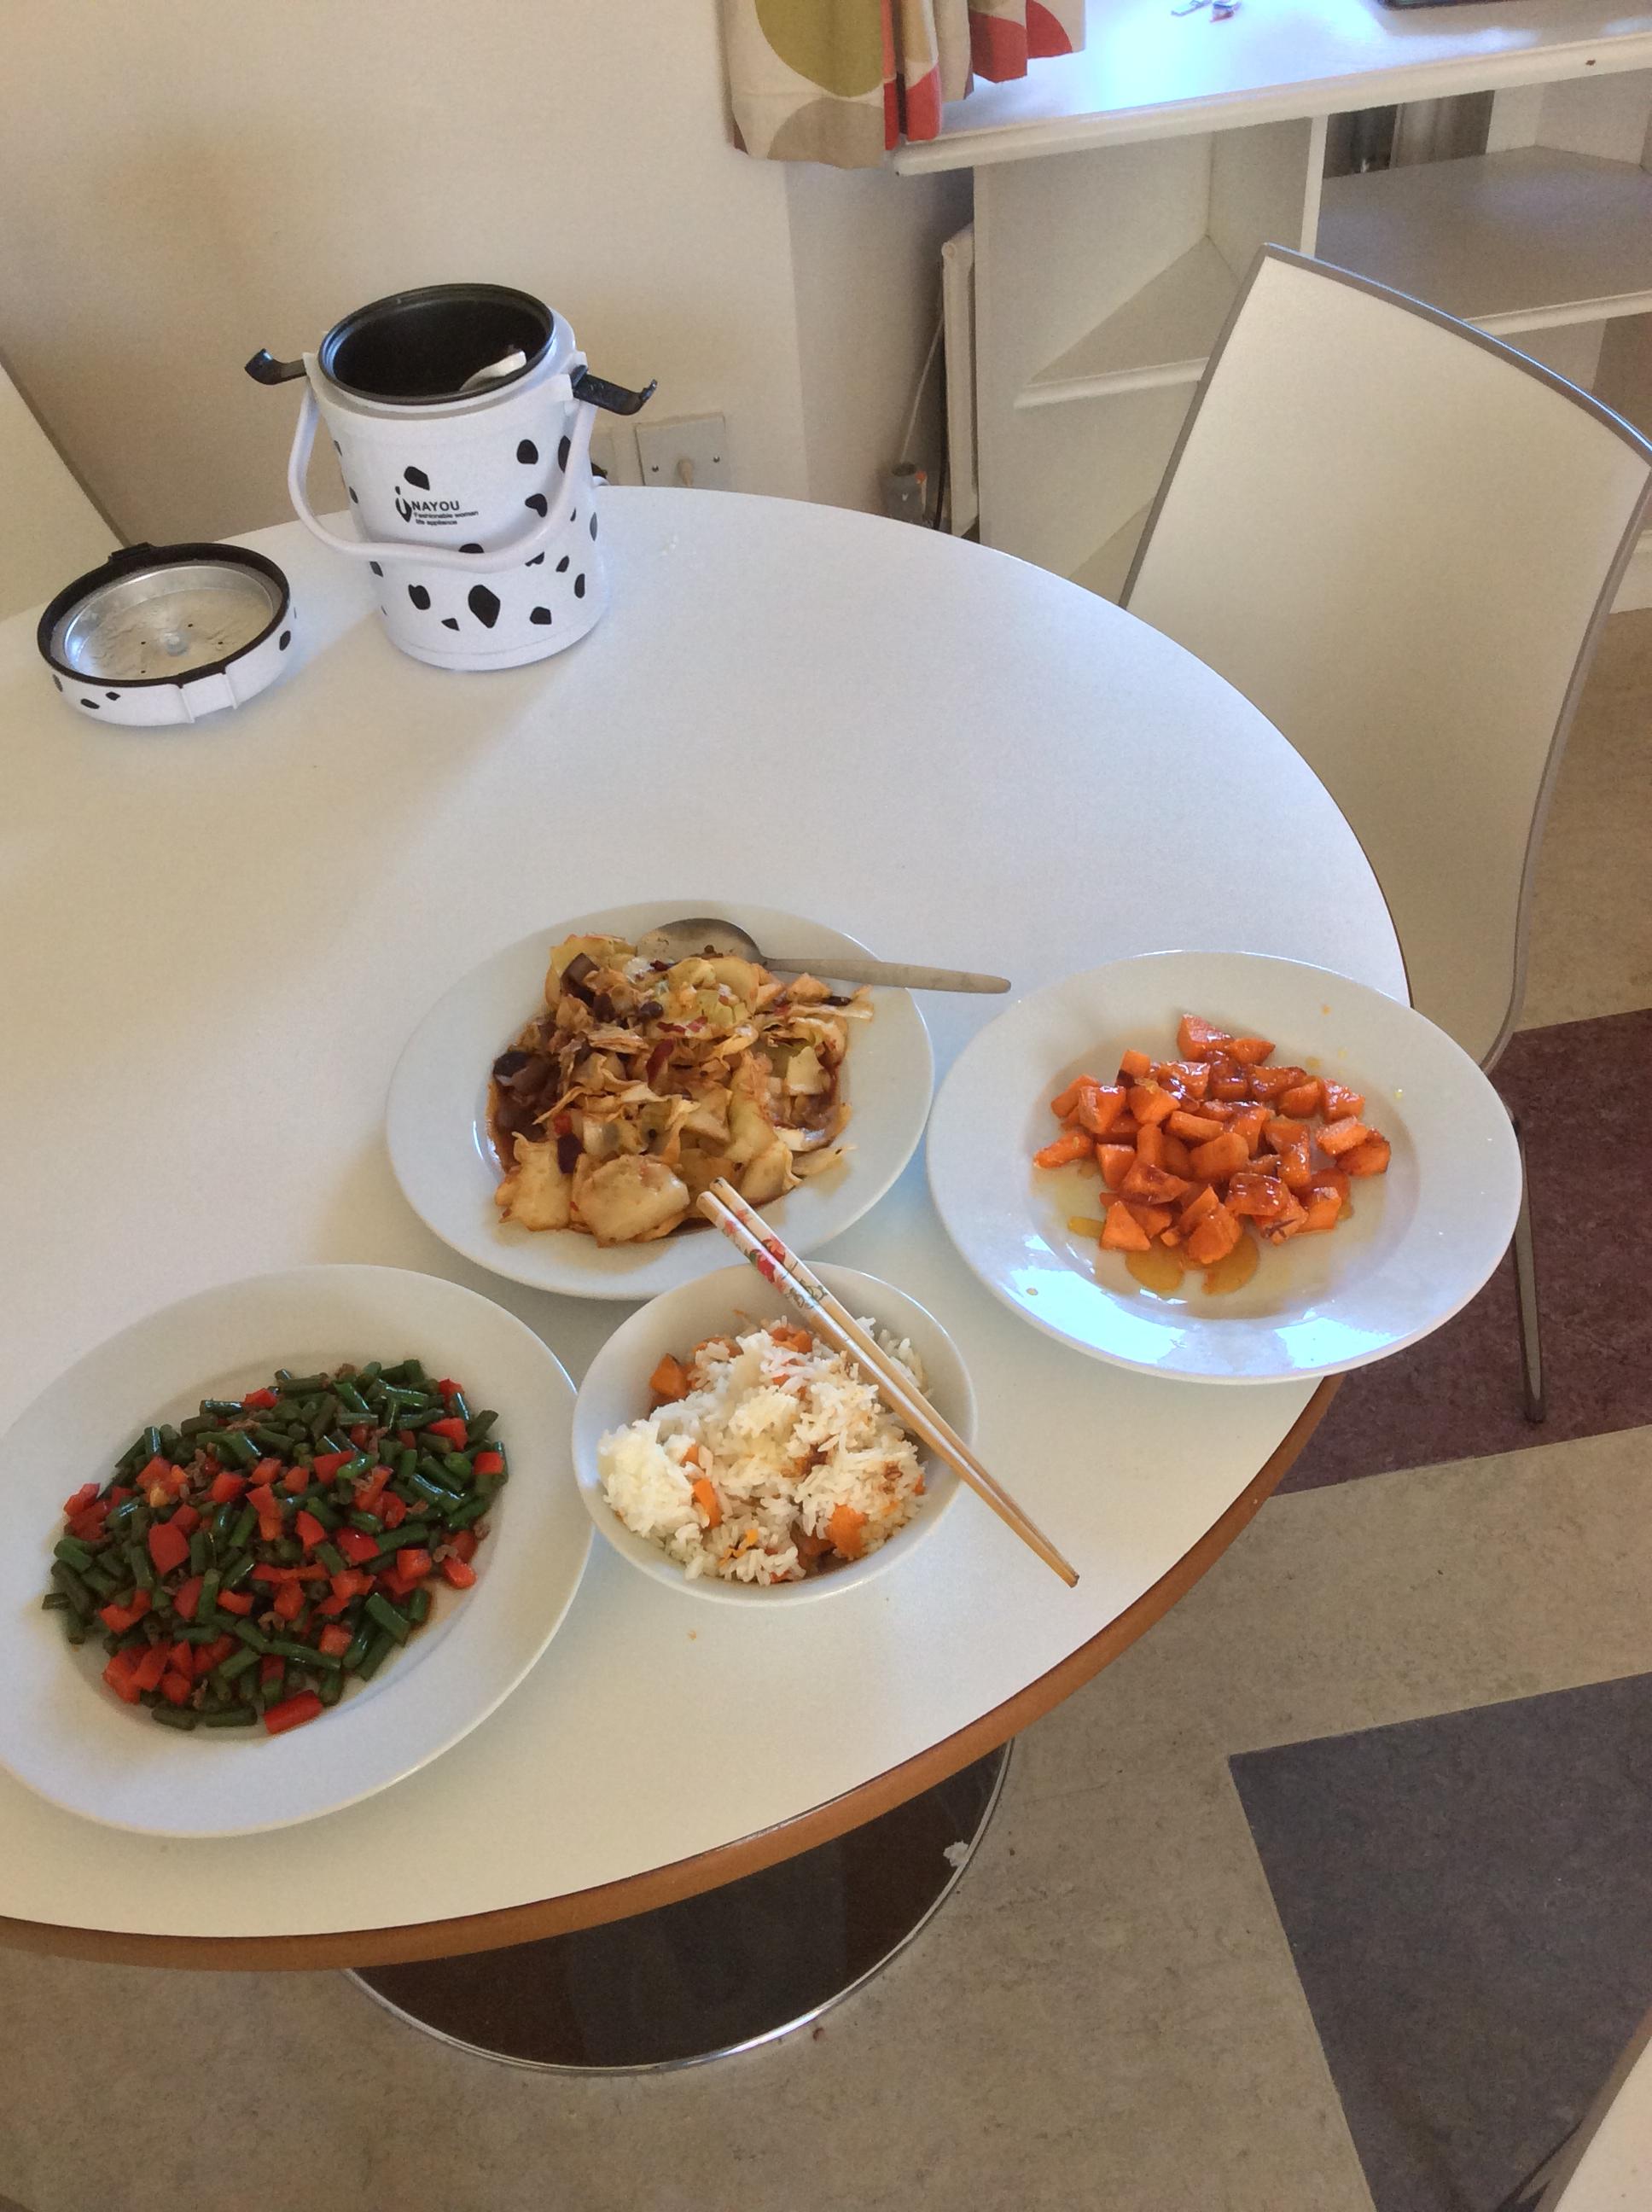 Food glorious food at ul by xiaoyu lin ul international for Ambassador chinese cuisine